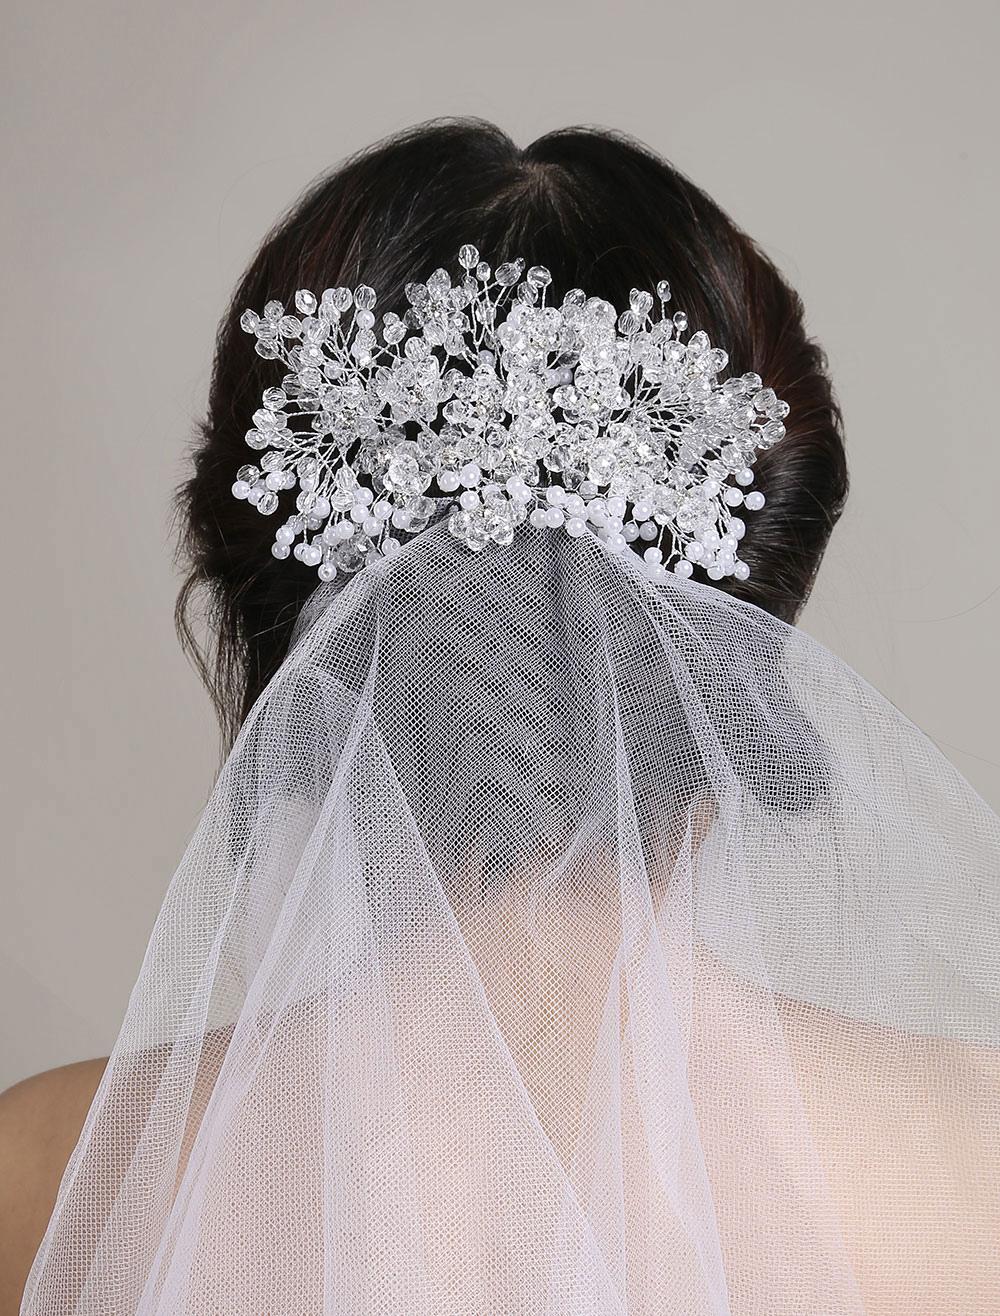 Tulle Wedding Veil White Two Tier Cut Edge Rhinestone Beaded Bridal Veil